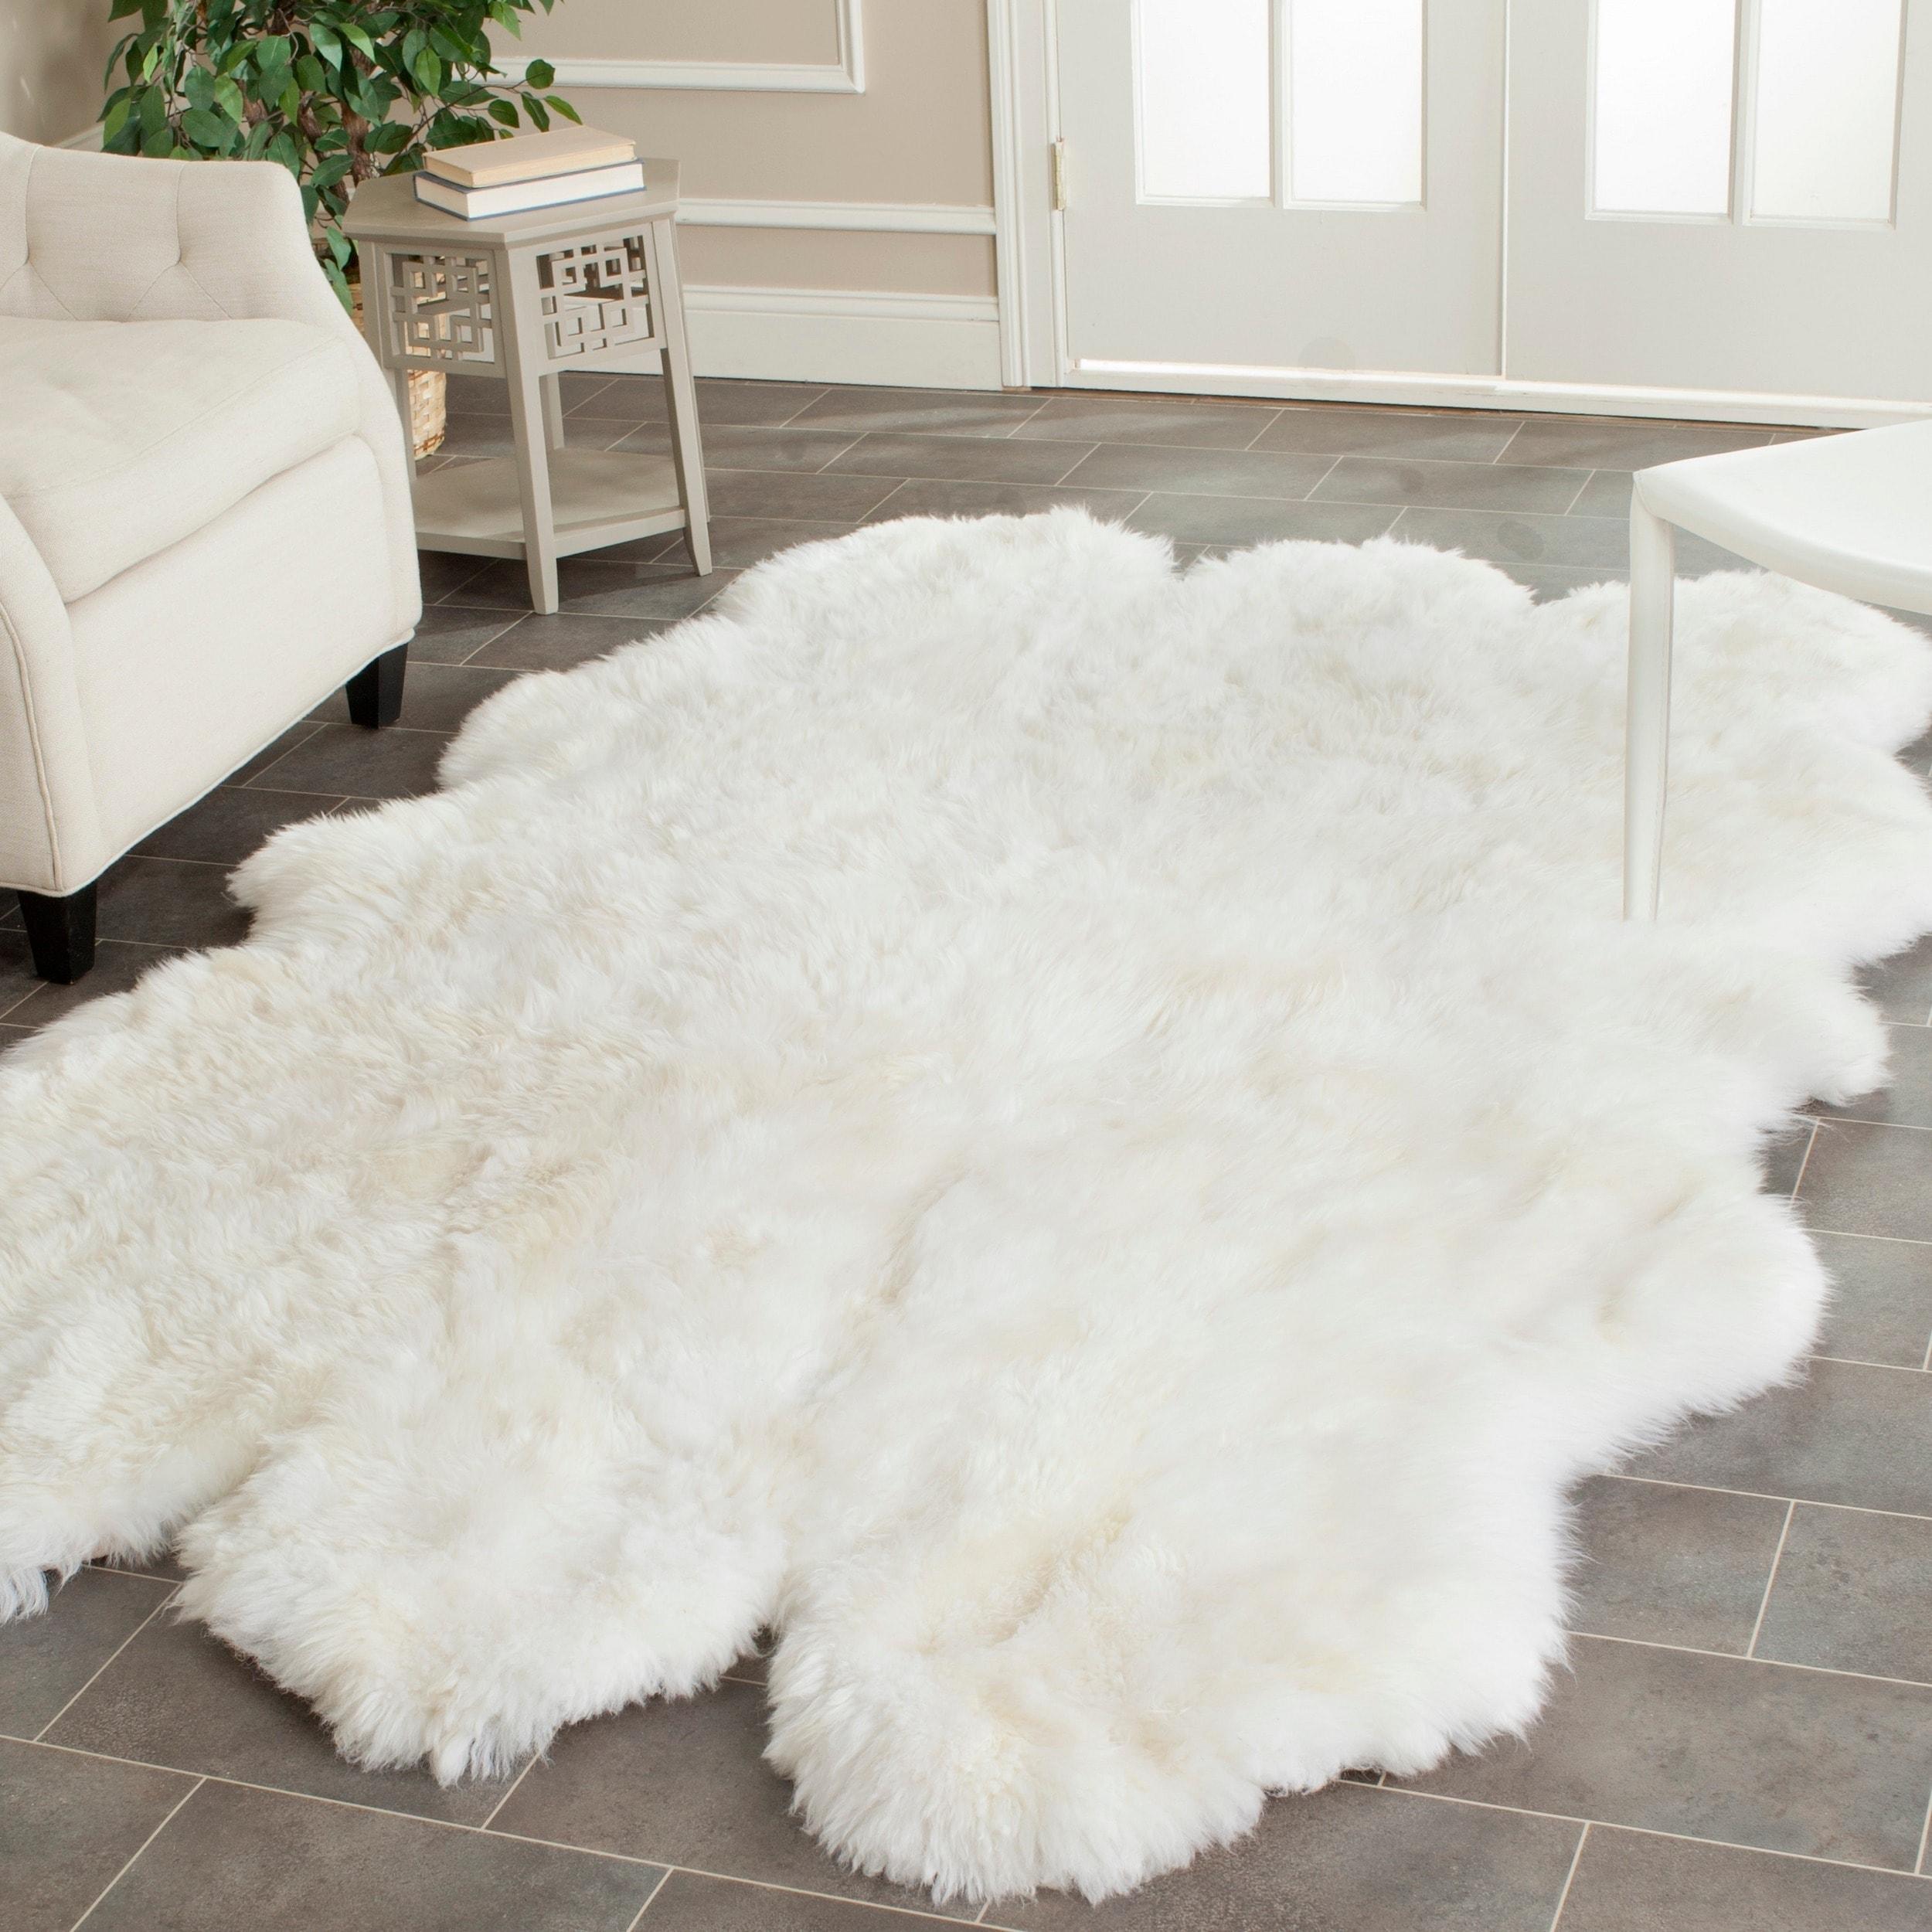 Safavieh Hand Woven Sheepskin Pelt White Rug 5 X 8 Free Shipping Today 15270789